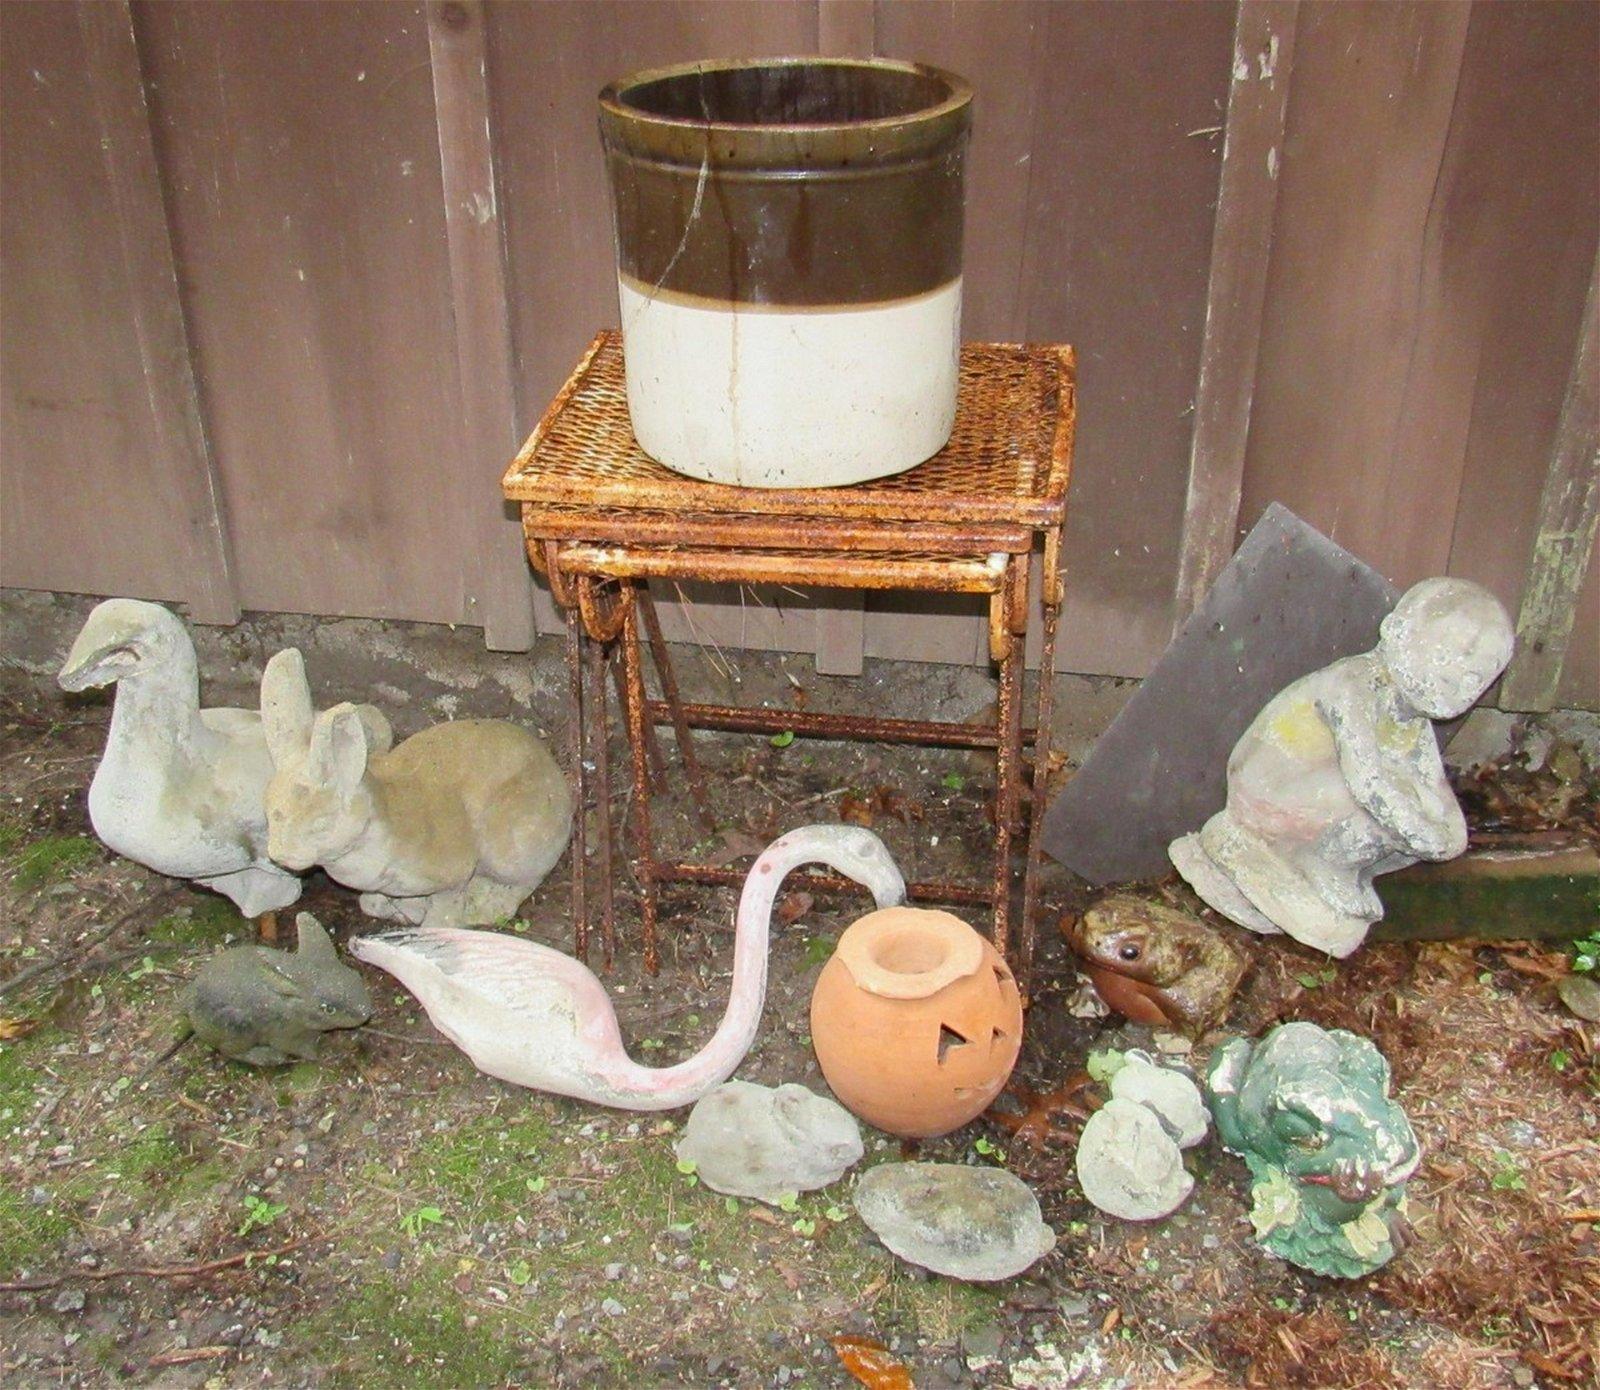 Concrete Yard Ornaments Nesting Table Crock